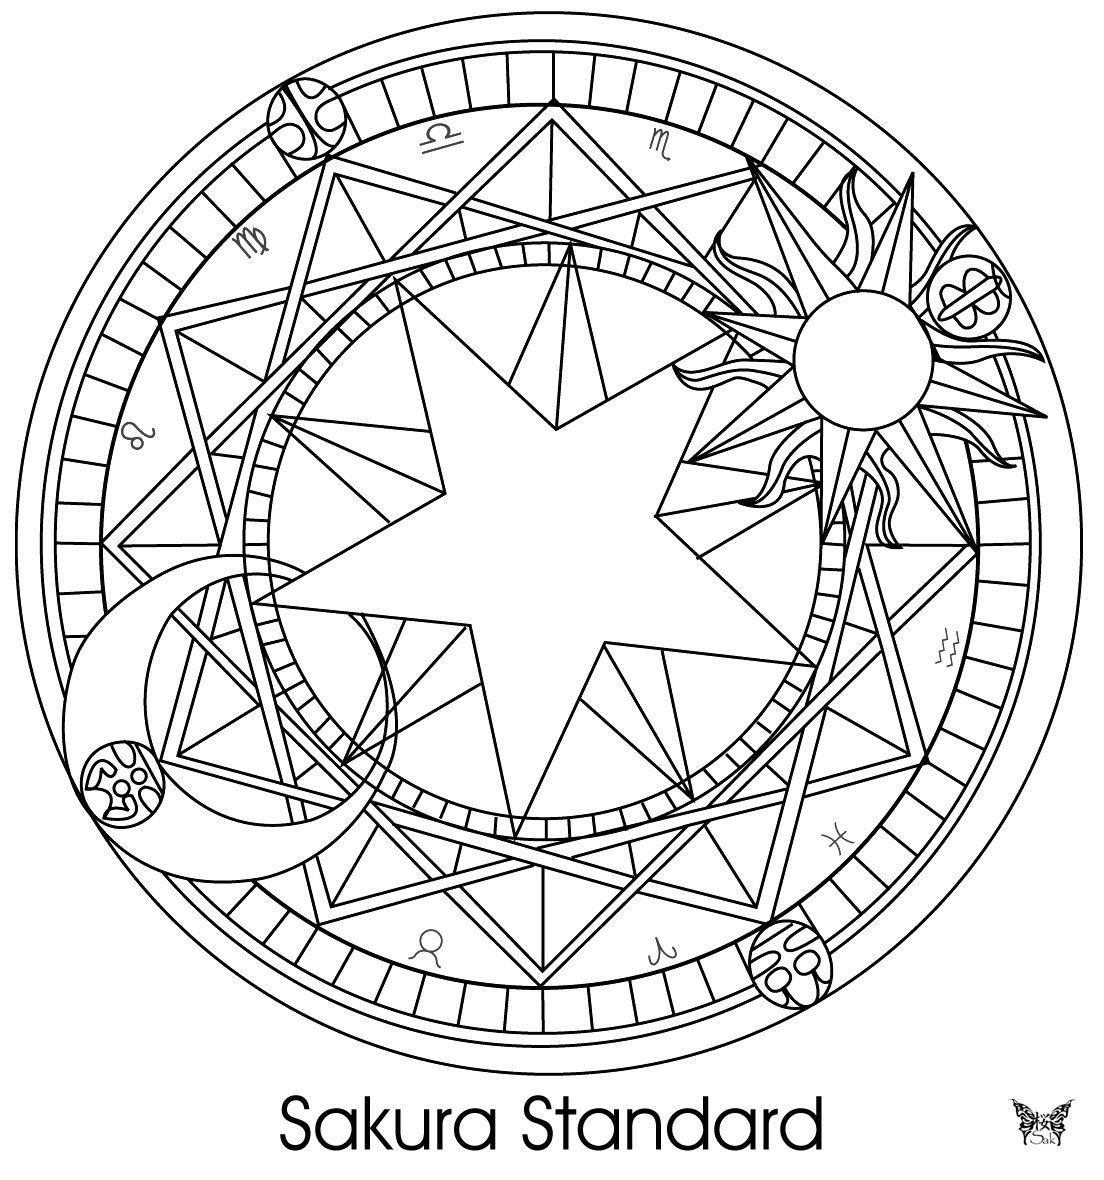 Cardcaptor Sakura Sakura Tattoo Sakura Card Cardcaptor Sakura